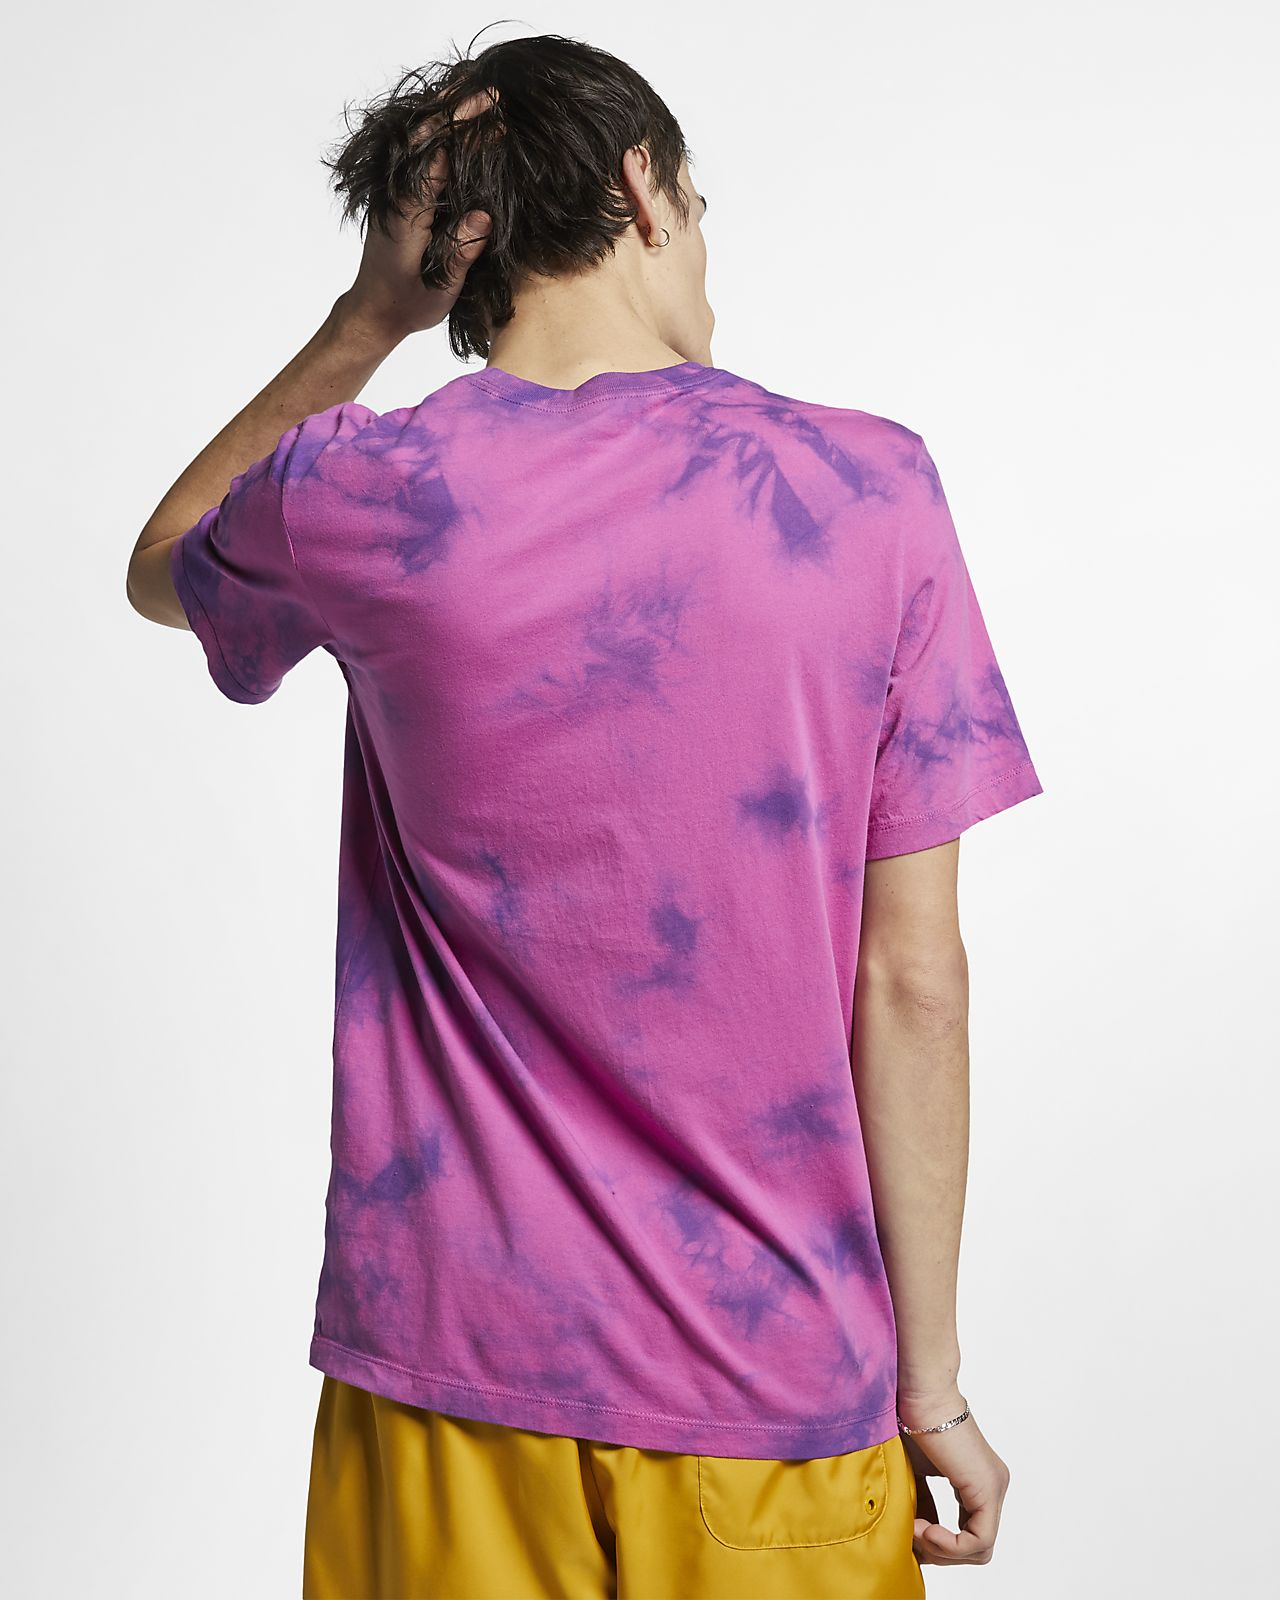 a086c3cad Nike Tie Dye T Shirts | Top Mode Depot